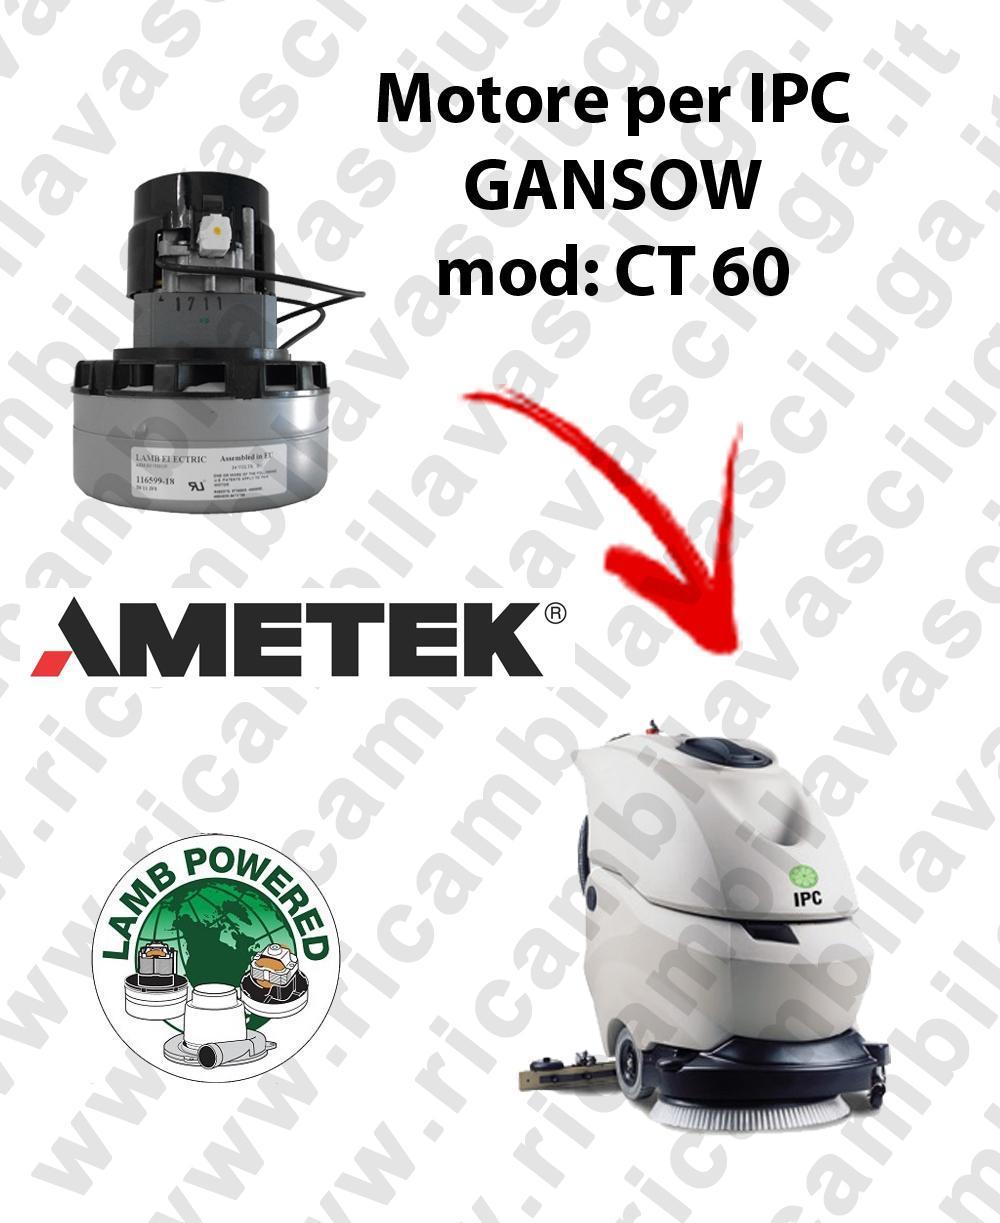 CT 60 LAMB AMETEK vacuum motor for scrubber dryer IPC GANSOW